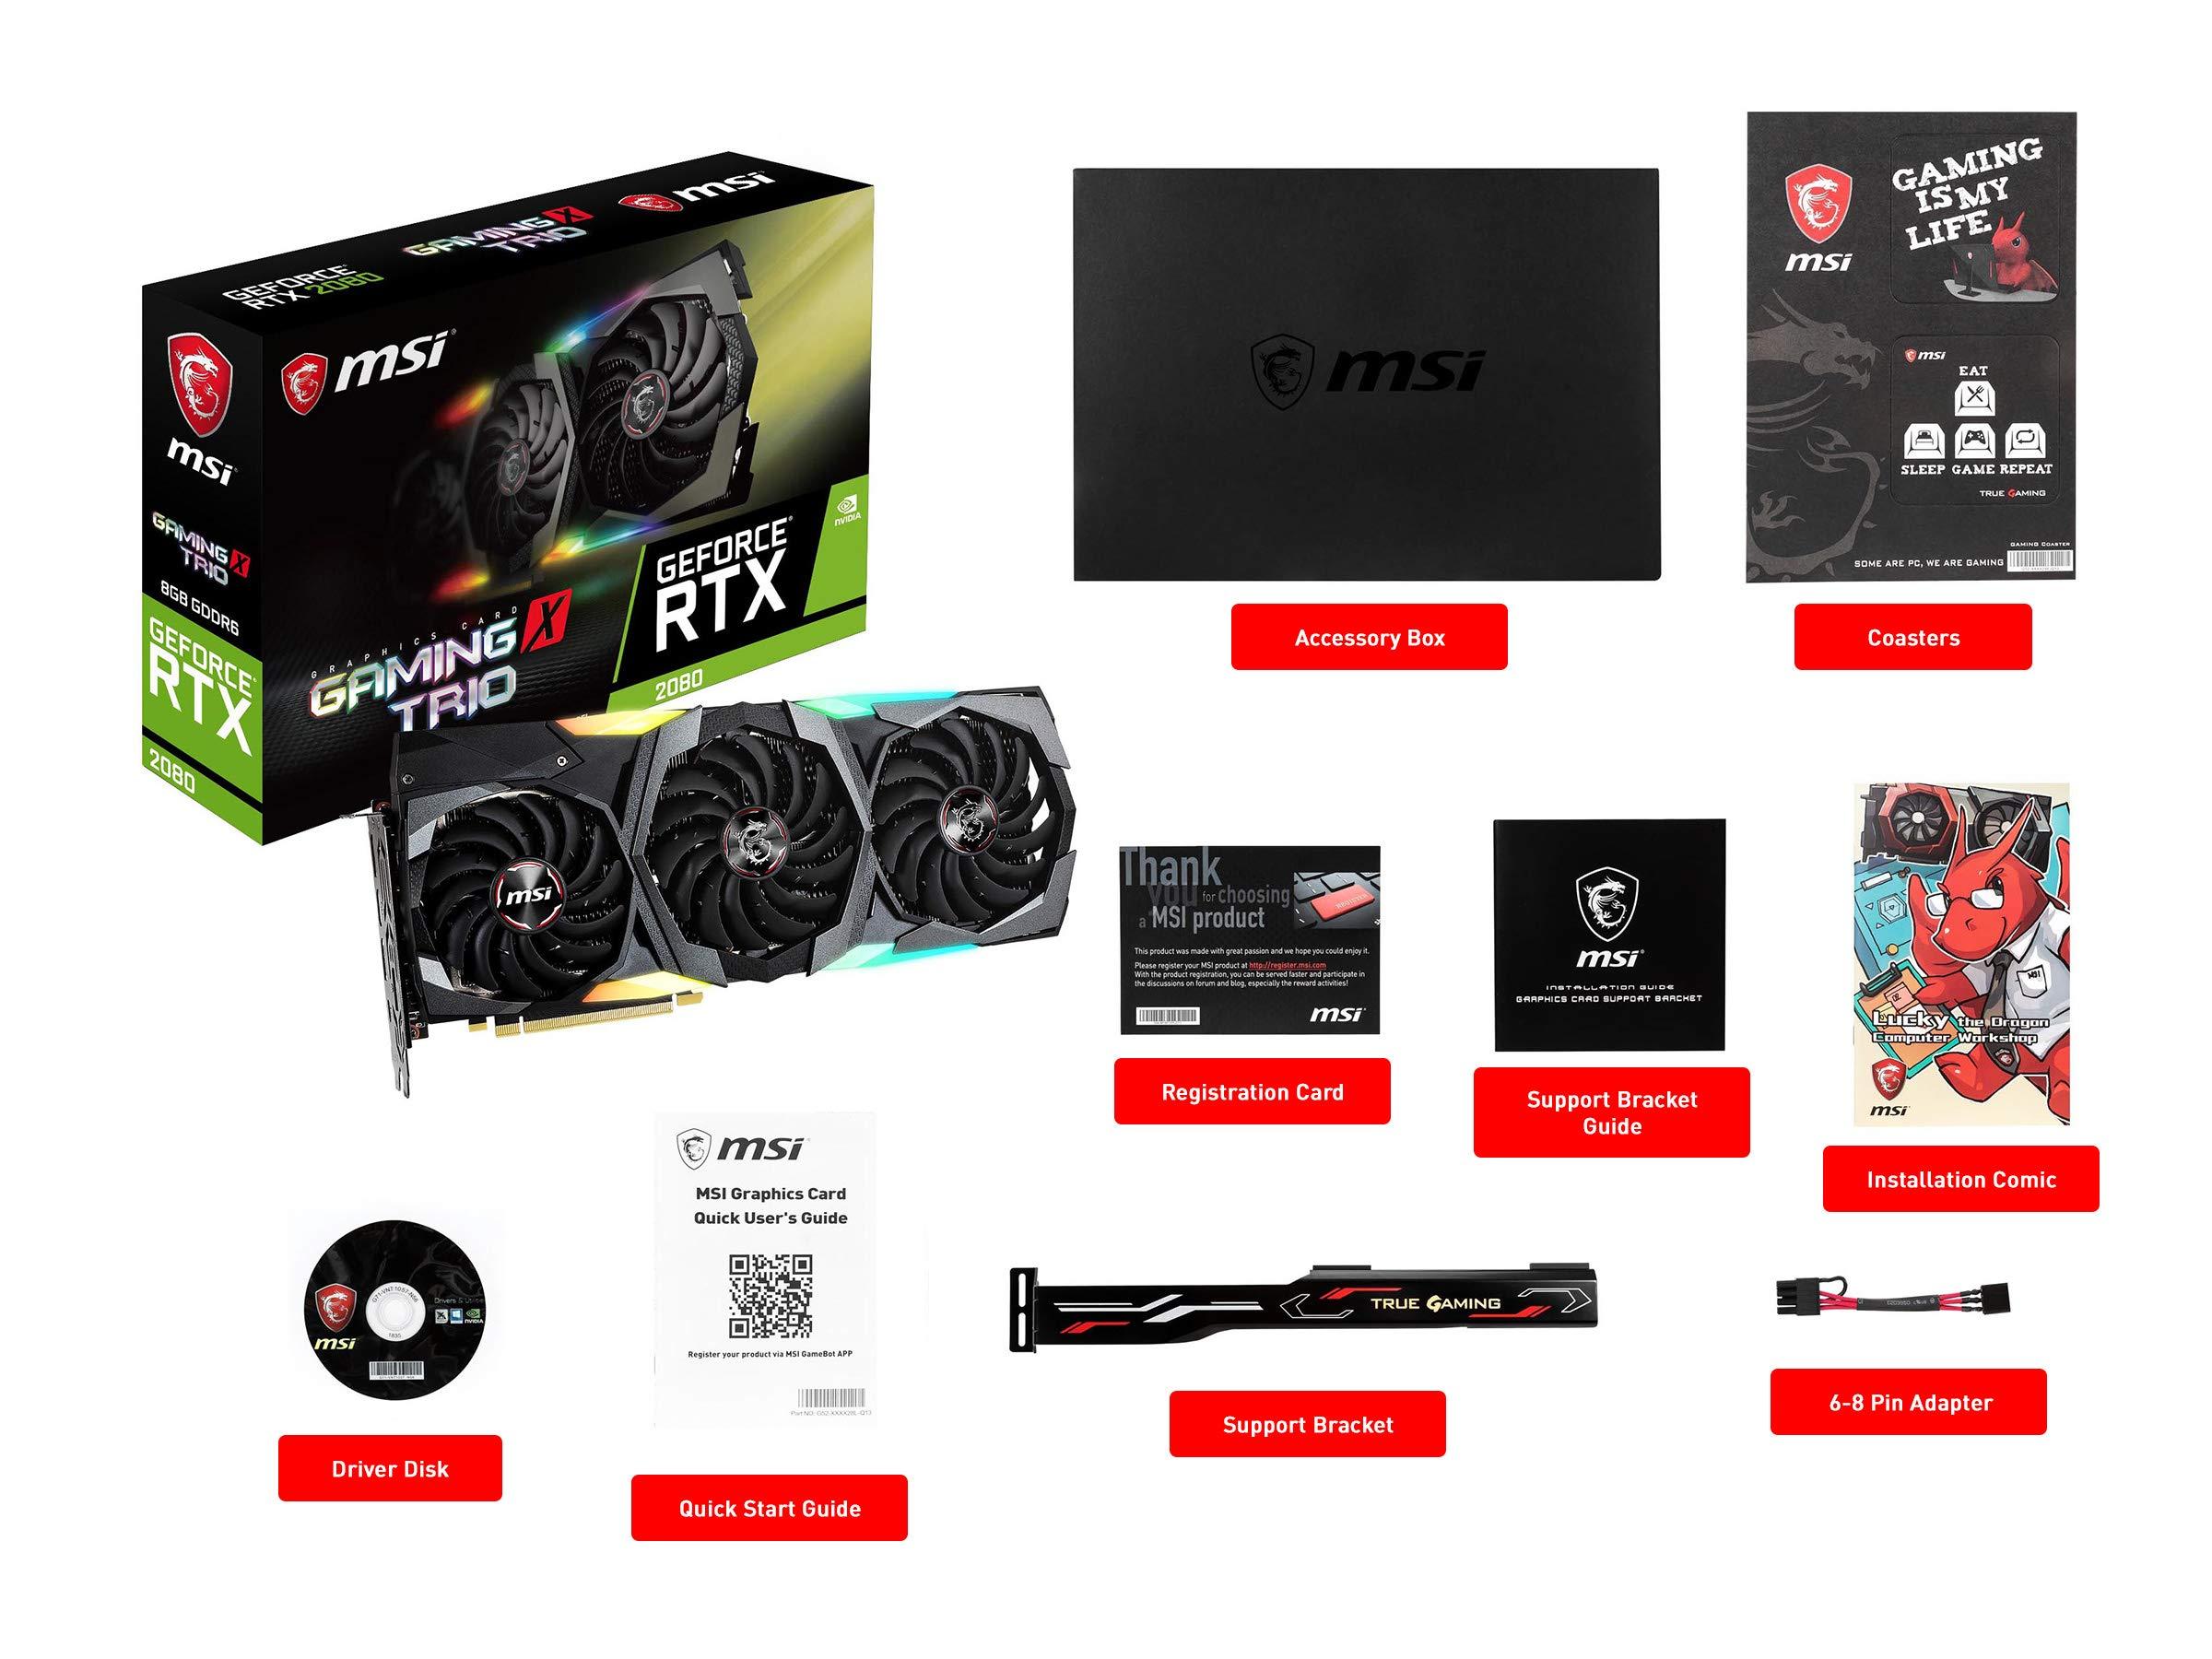 MSI Gaming GeForce RTX 2080 8GB GDRR6 256-bit VR Ready Graphics Card (RTX 2080 GAMING X TRIO) by MSI (Image #7)